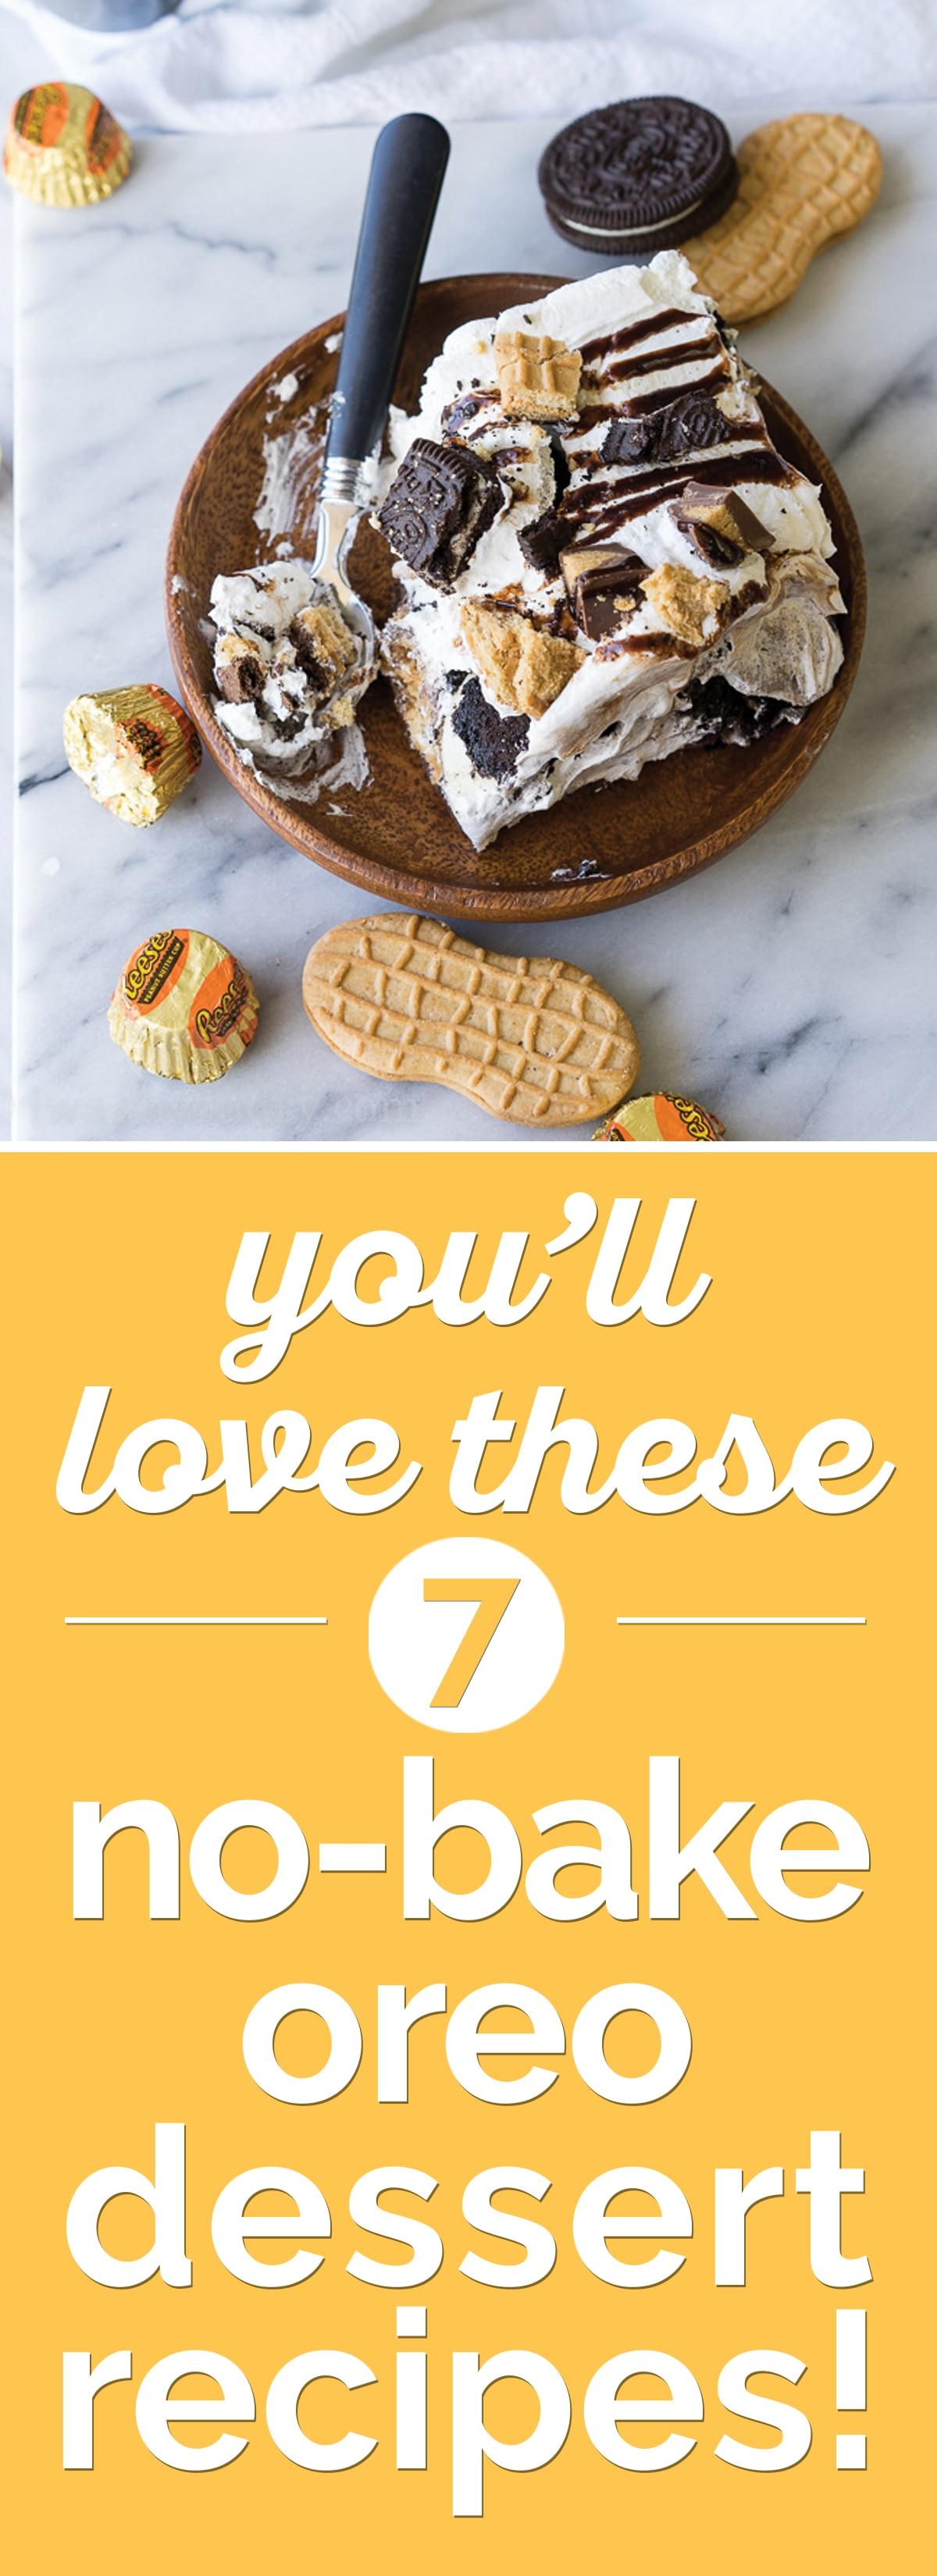 You'll Love These 7 No-Bake Oreo Dessert Recipes! | thegoodstuff